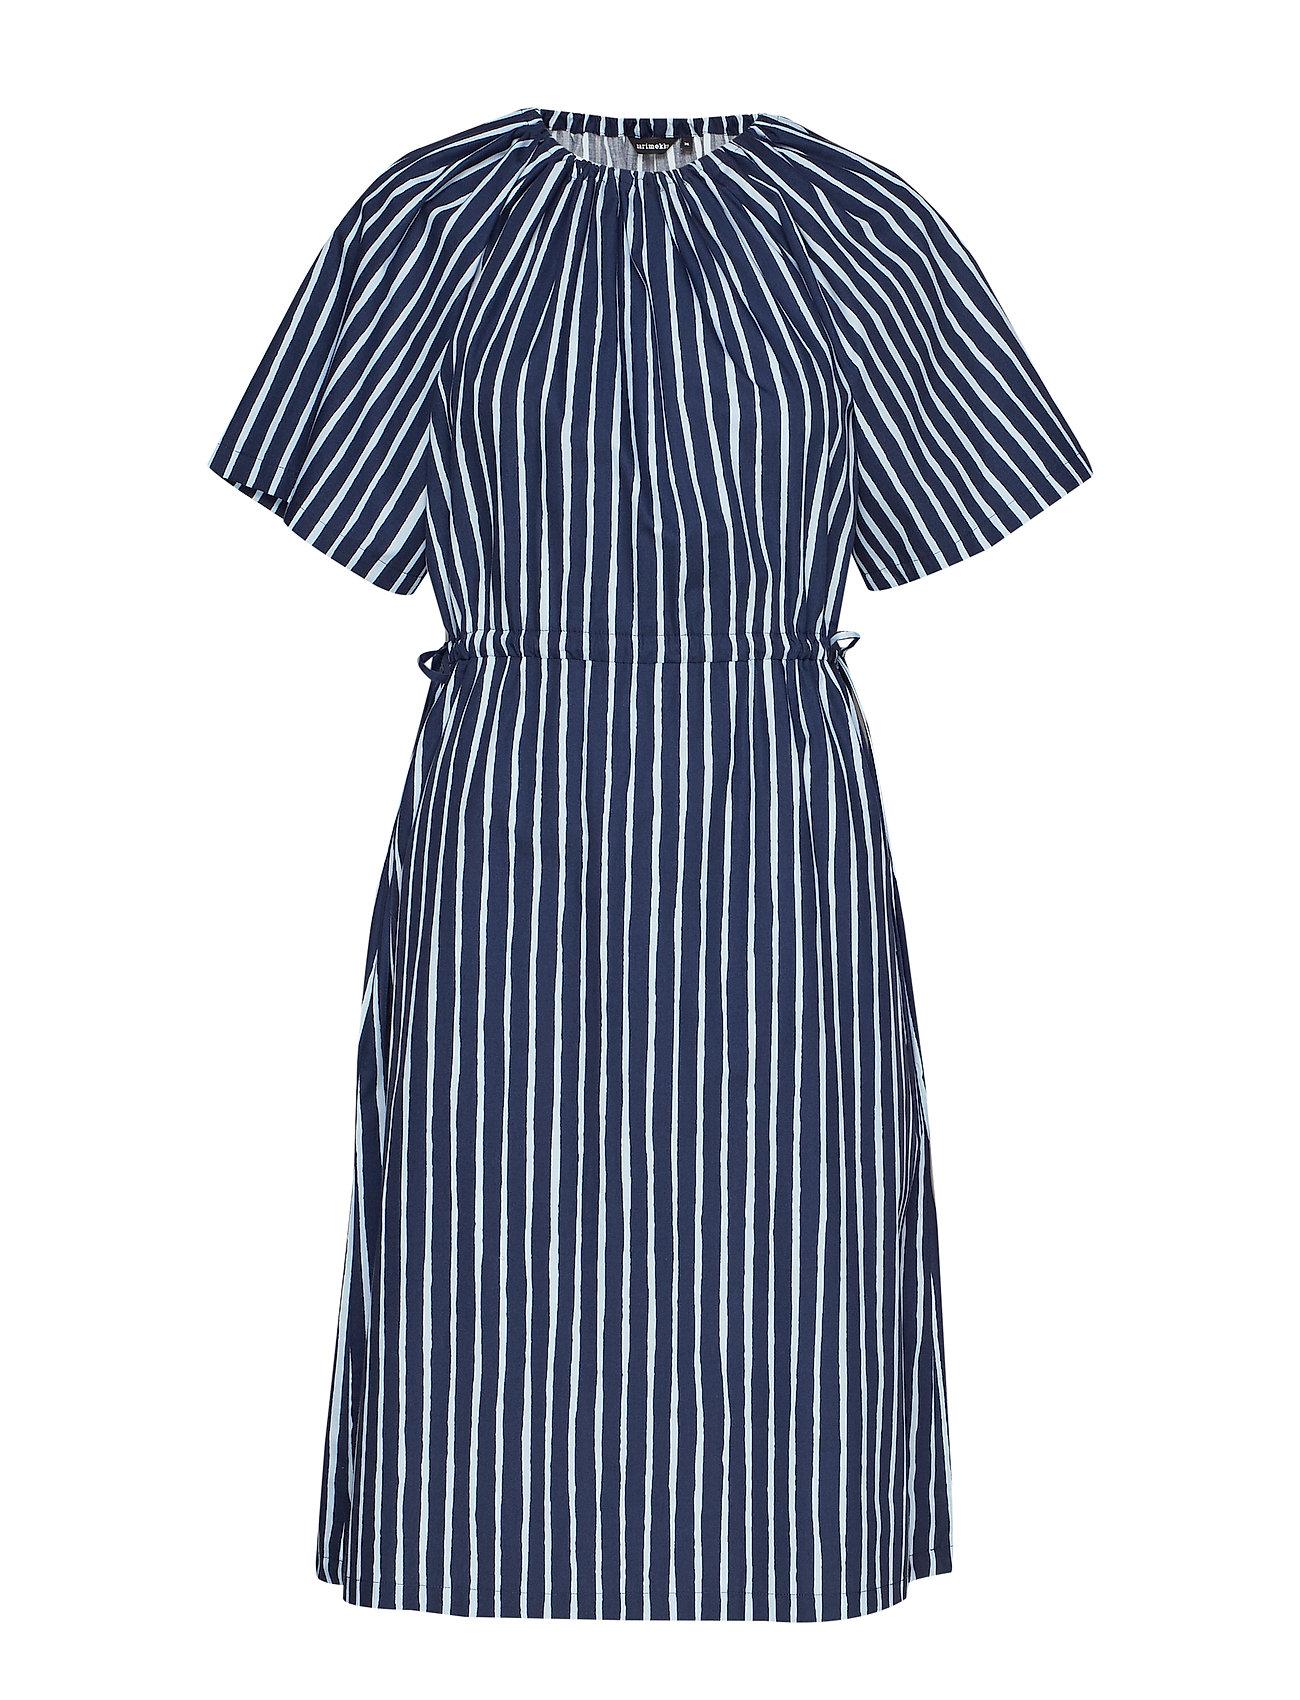 Marimekko SAMMAL PICCOLO Dress - DARK BLUE, BLUE